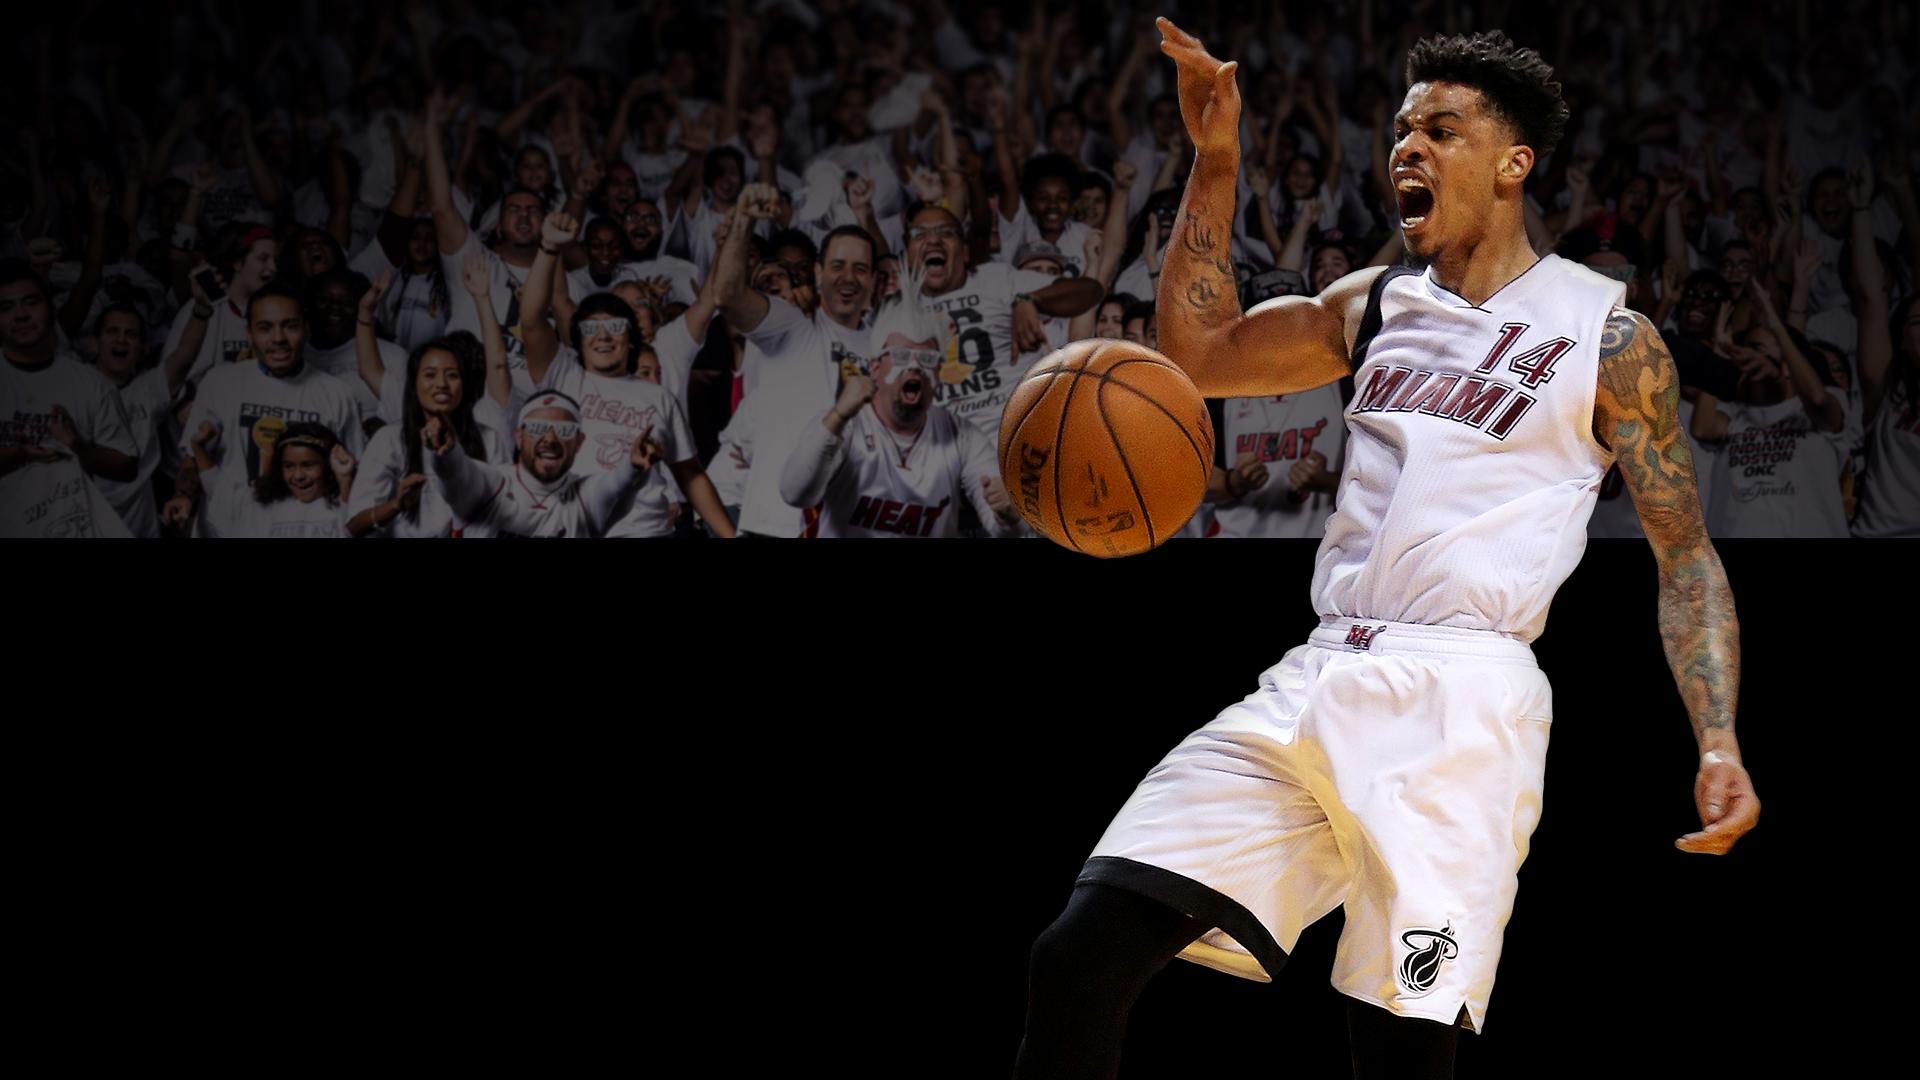 Miami Heat Basketball Player Wallpaper HD 1080p hd background hd 1920x1080